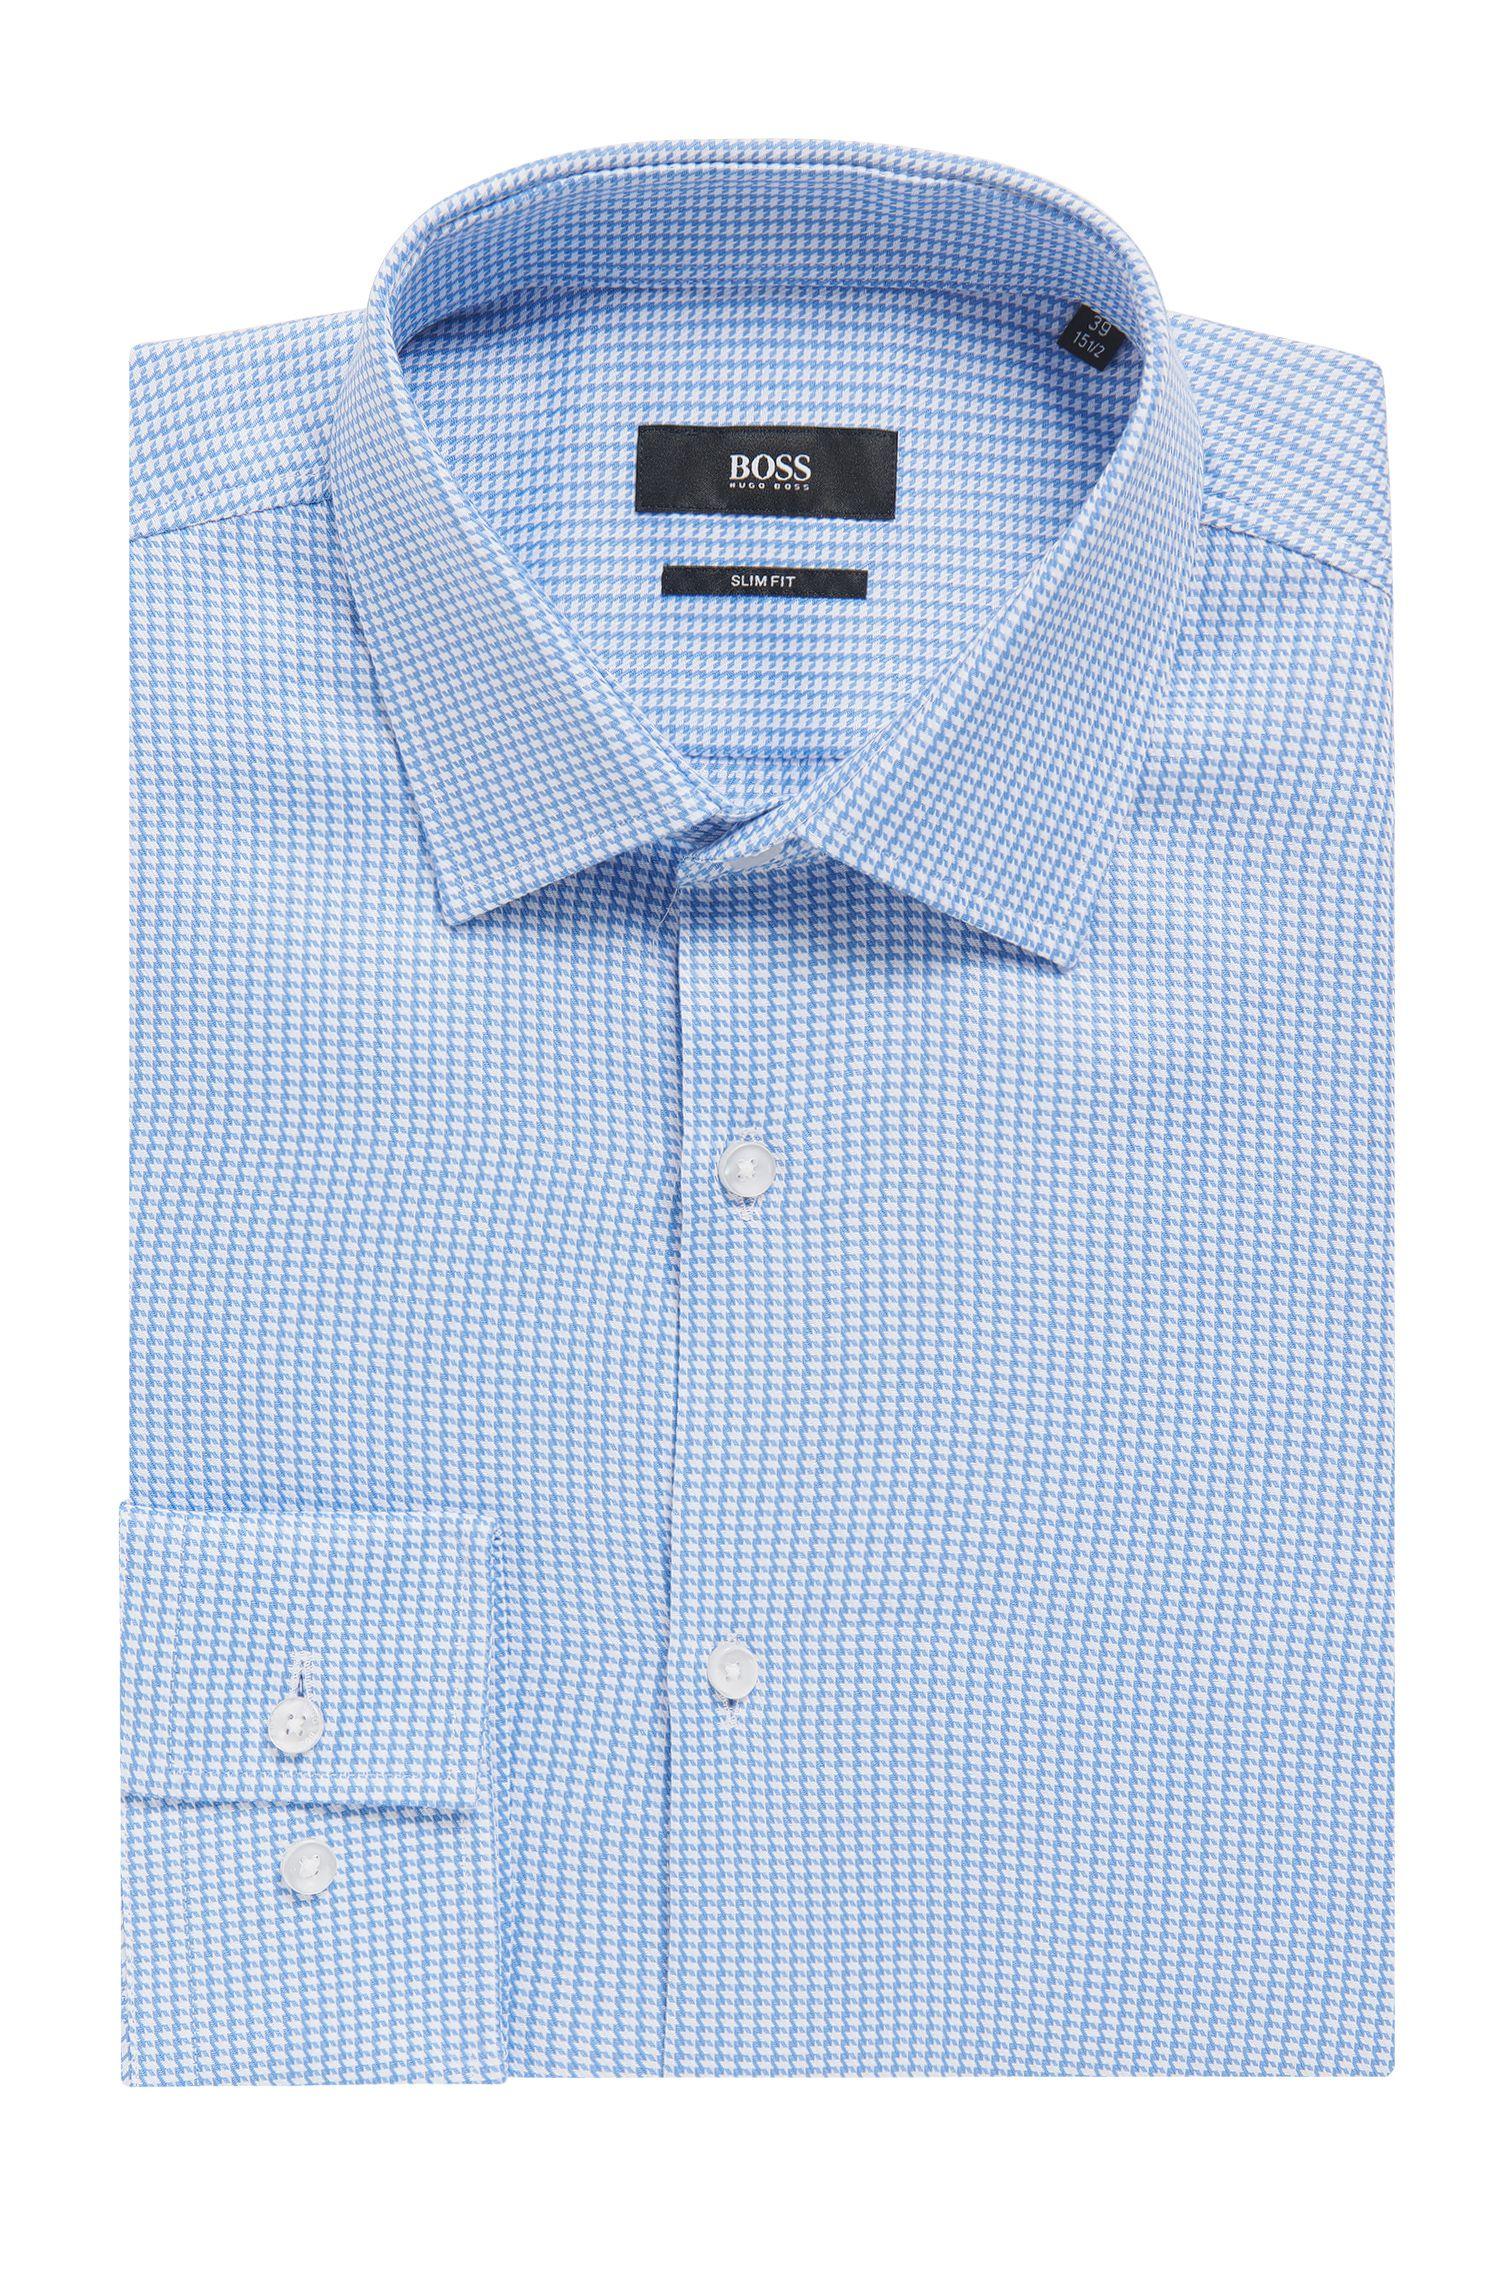 Italian Cotton Dress Shirt, Slim Fit | Jenno